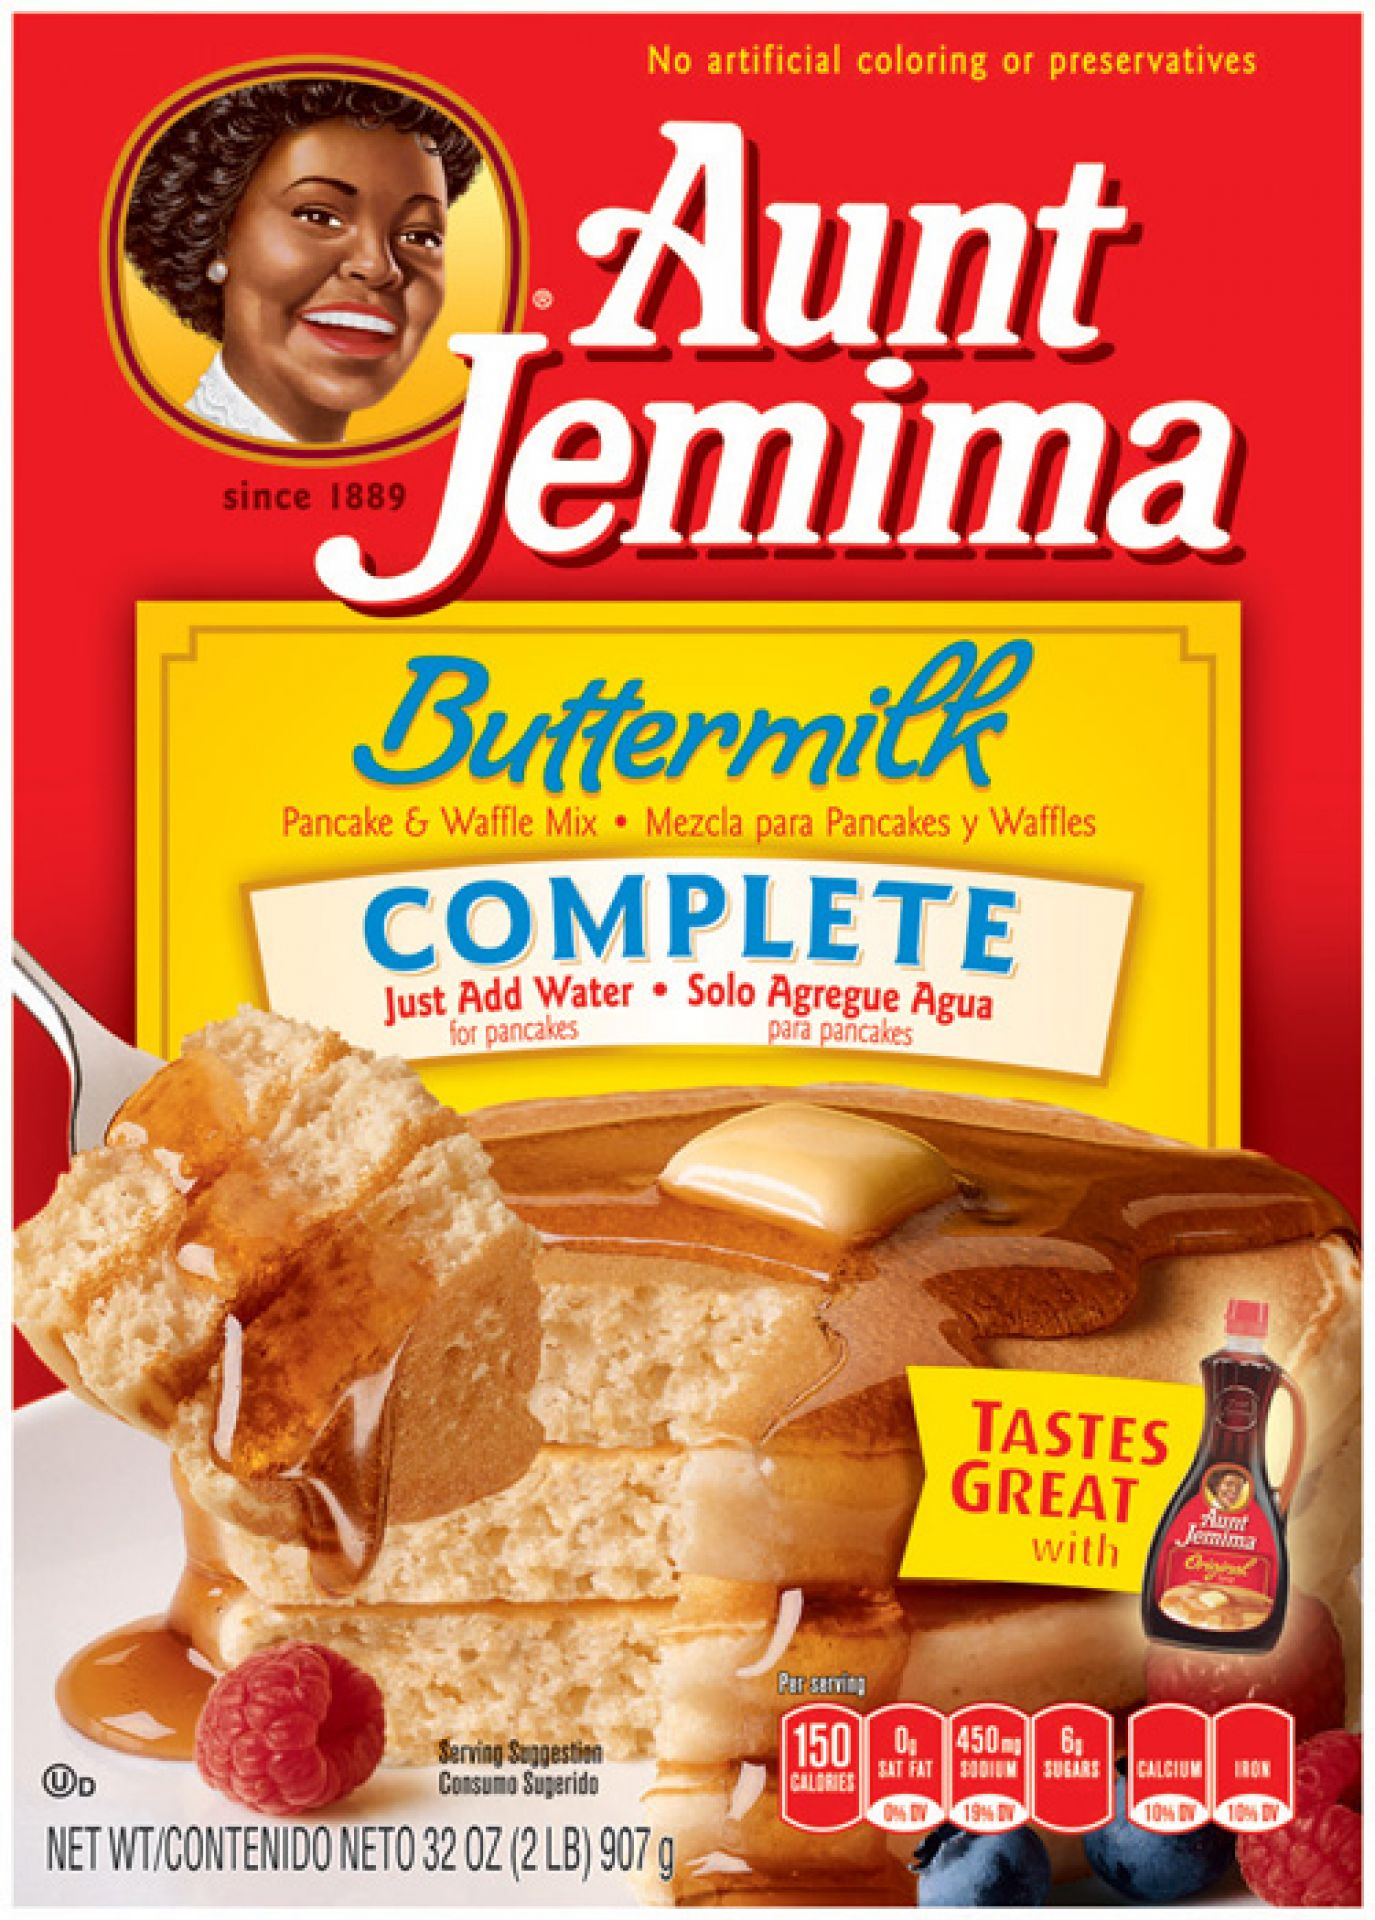 Aunt Jemima Buttermilk Complete Pancake Mix 907 g